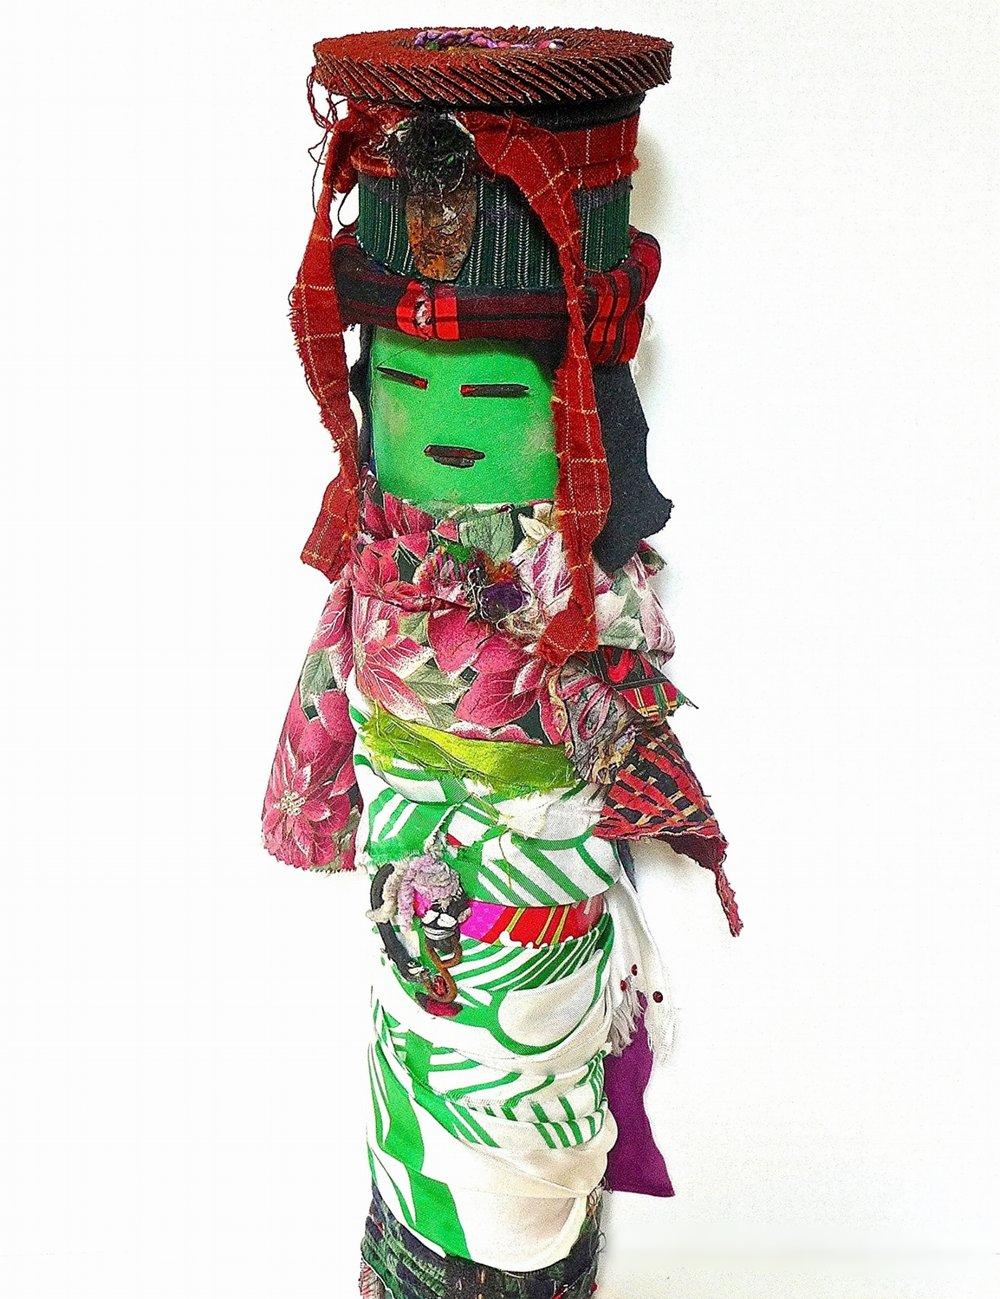 Foreigner.  Textile, rust, sanding disk, paper, yarn, metal, plastic, wood, elastic, glitter on industrial cardboard tube. 22 x 8 in. round (55.88 x 20.32 cm.) 2015